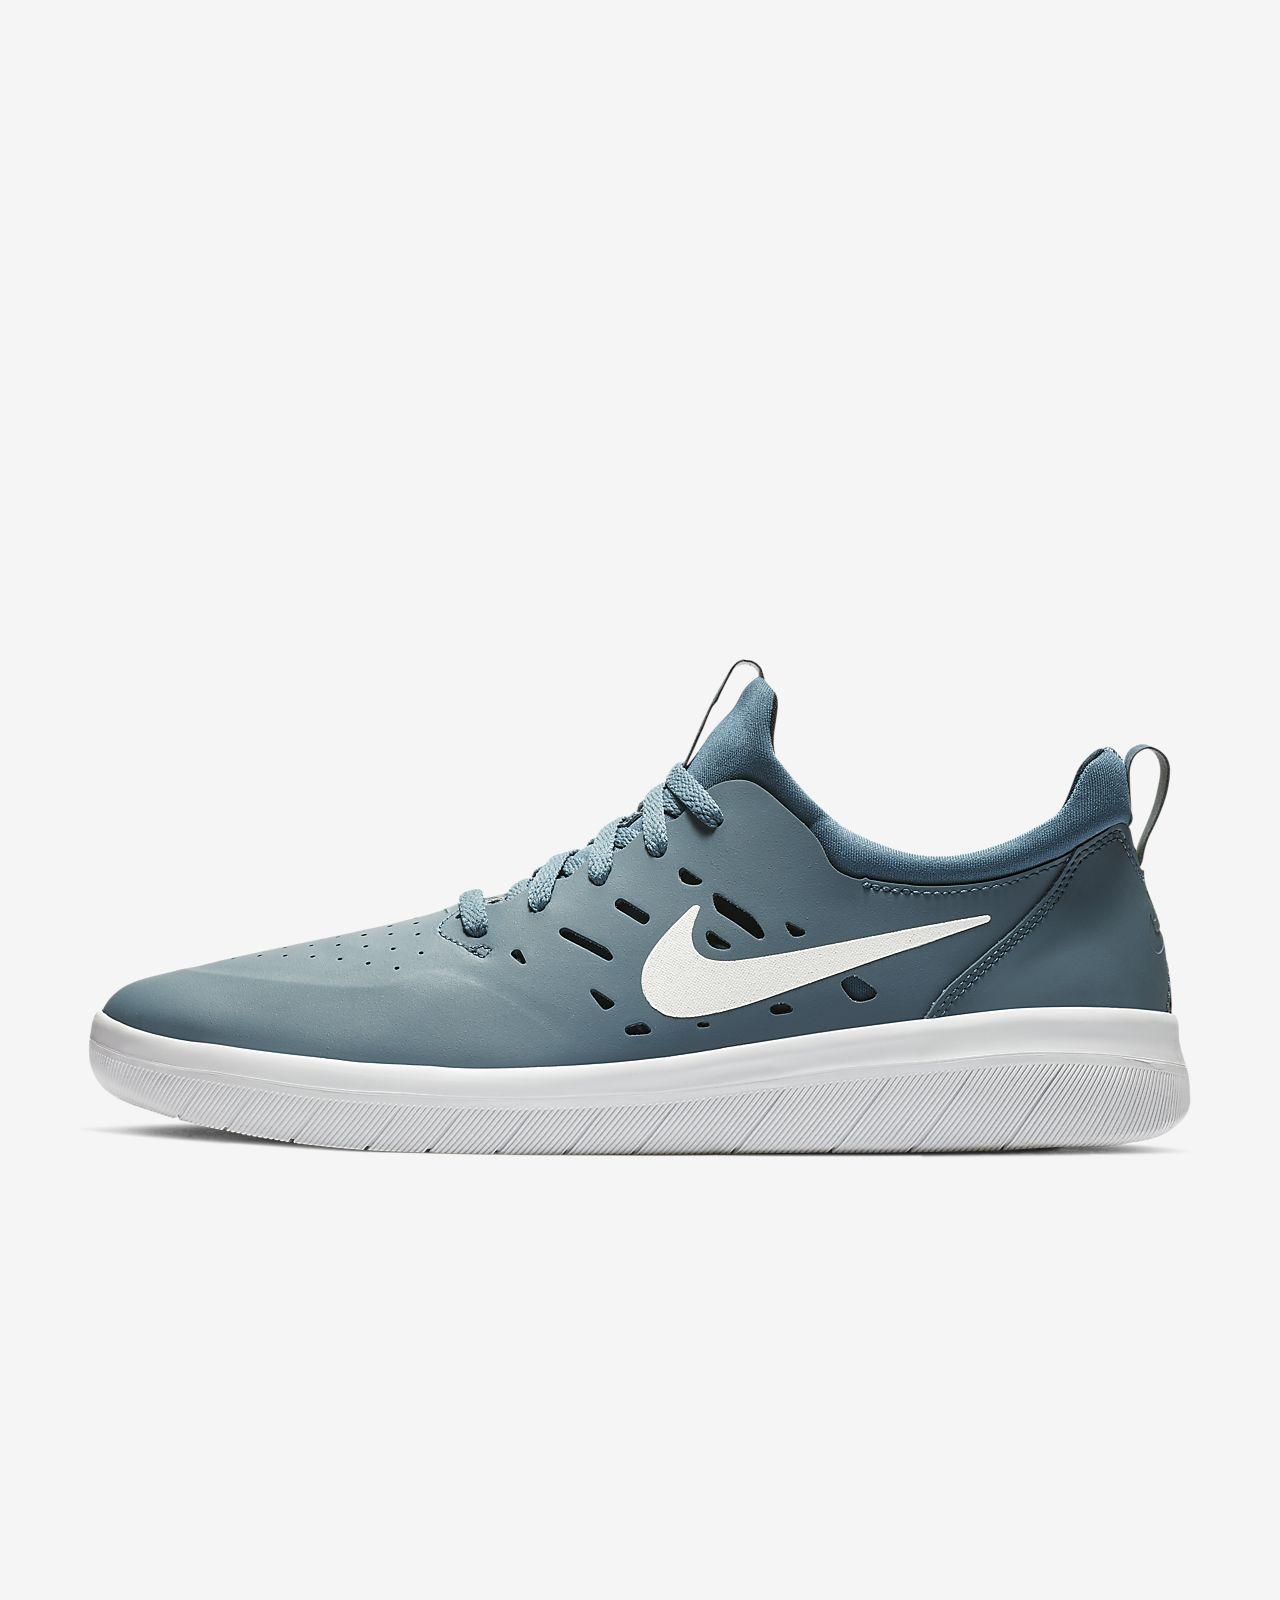 6a6e236bba8be7 Nike SB Nyjah Free Skate Shoe. Nike.com GB